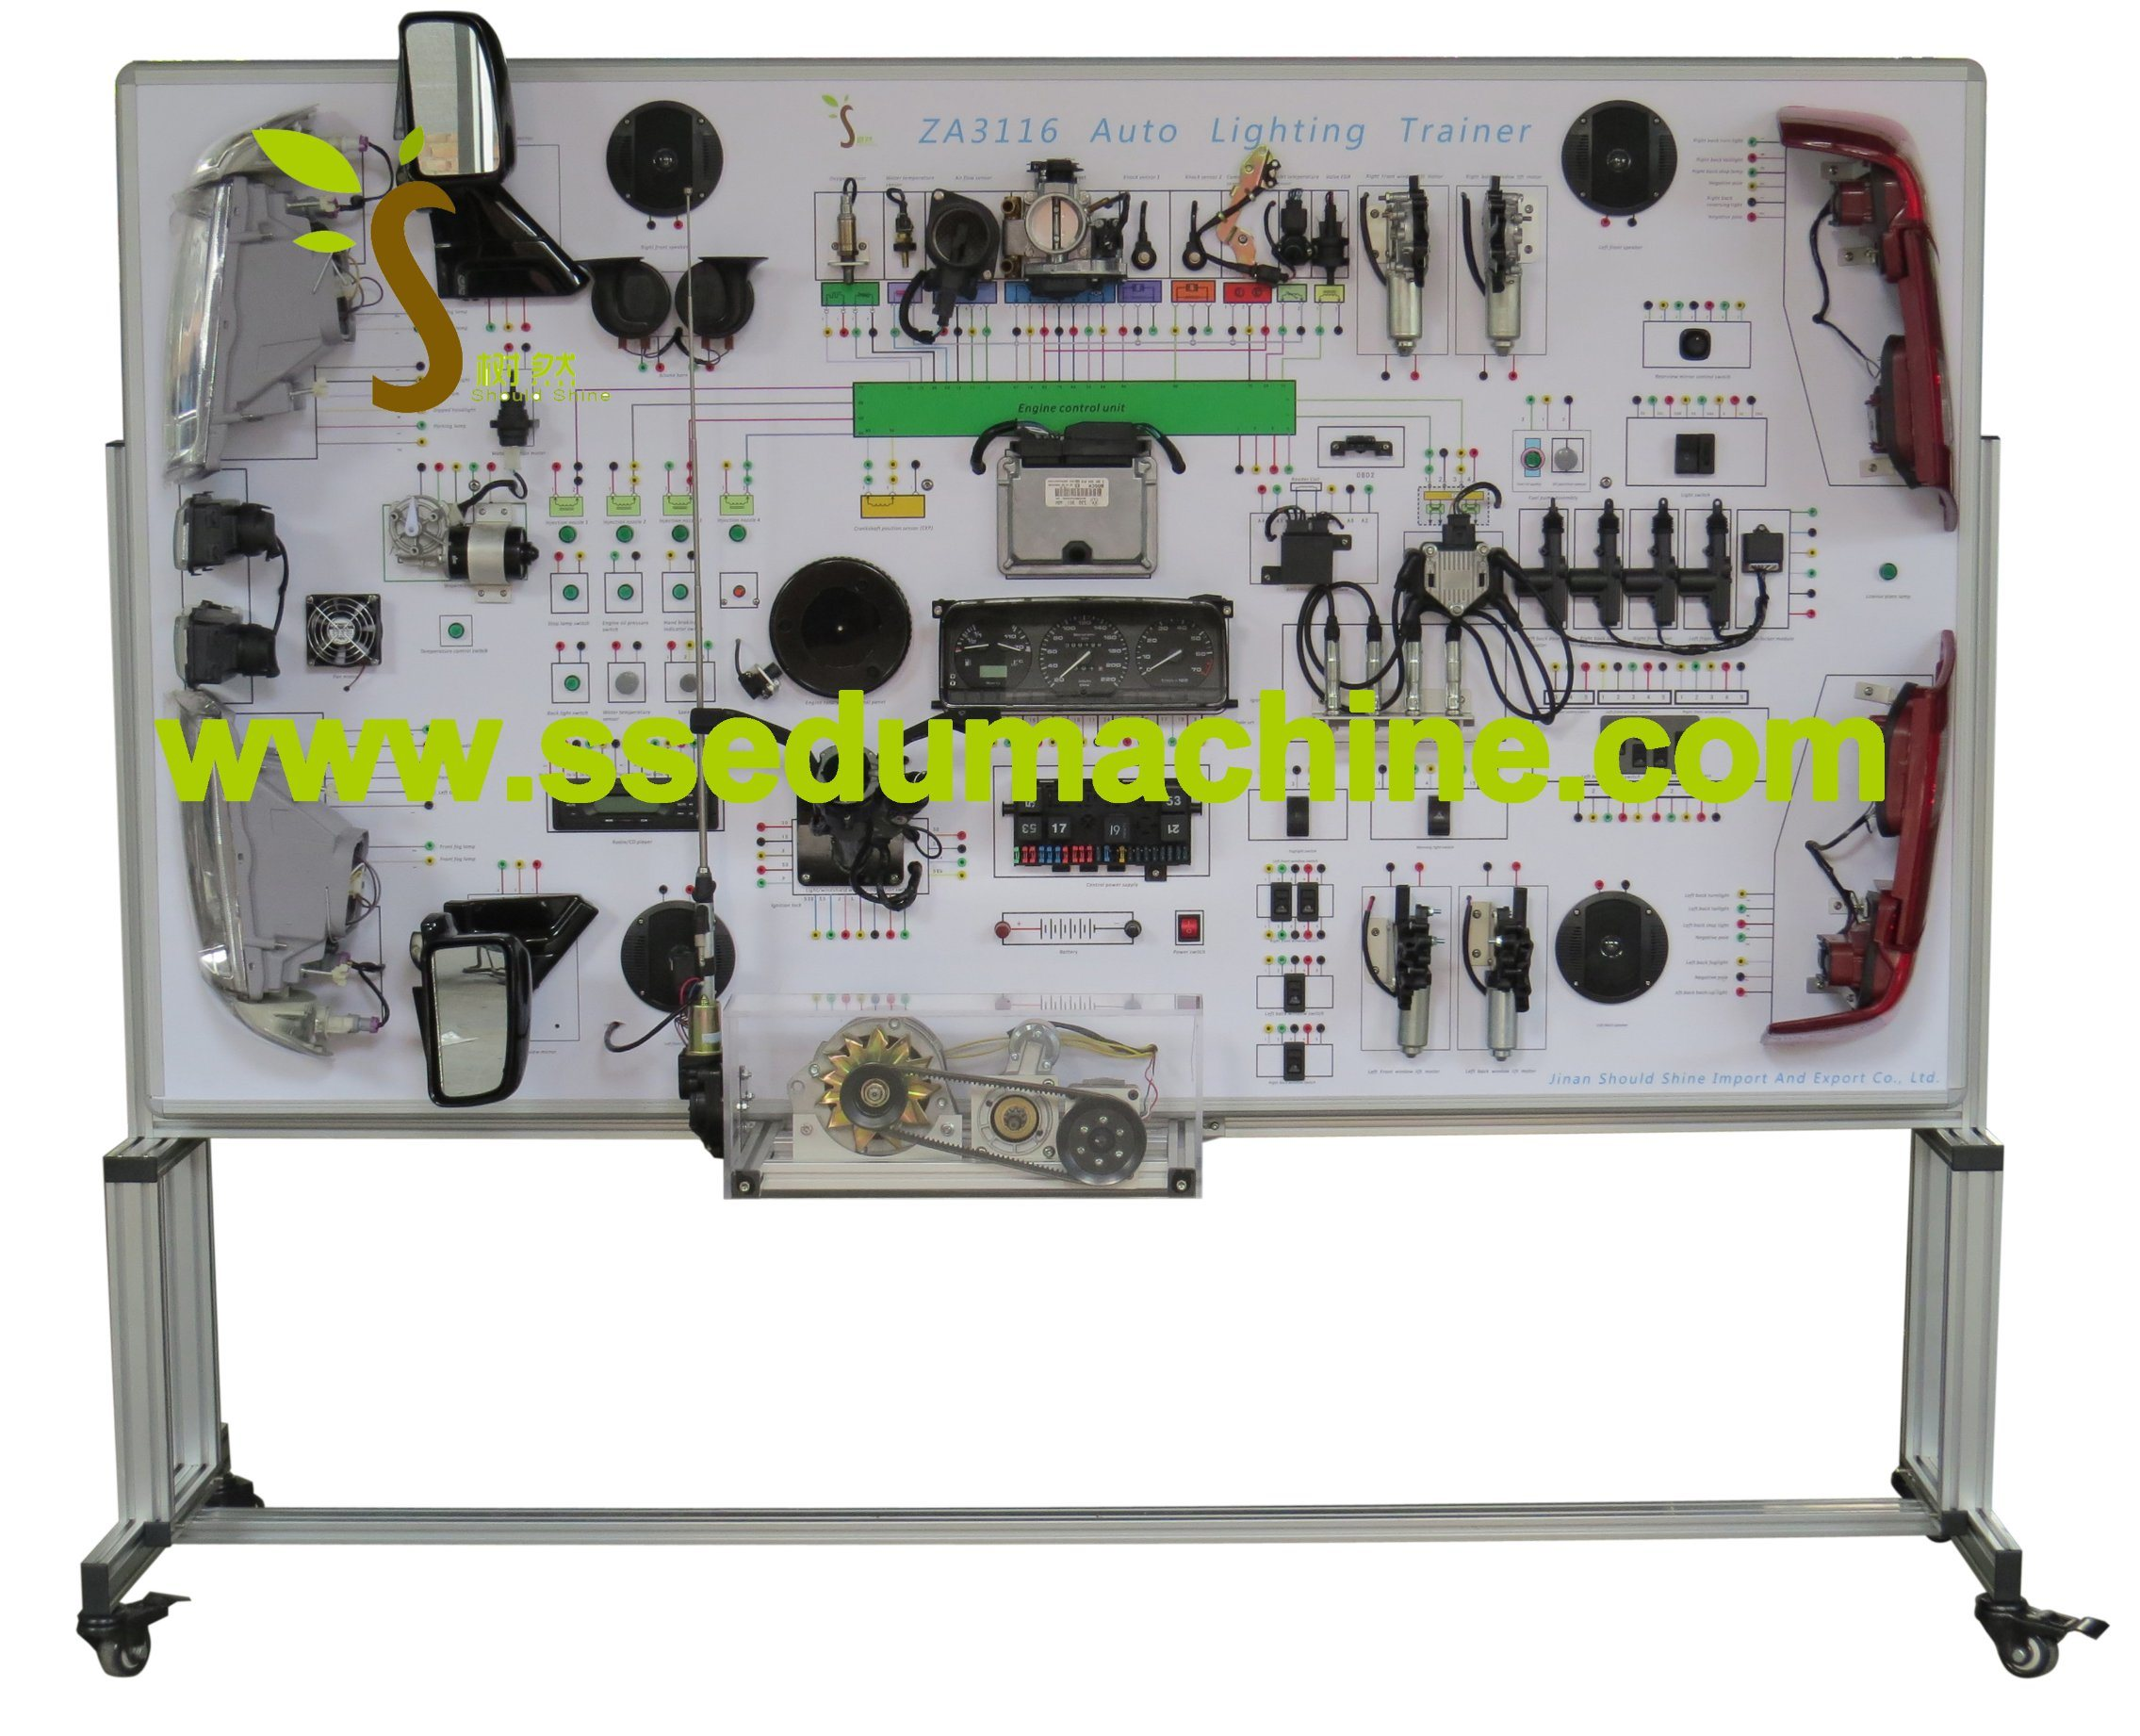 Santana Electric Teaching Board Education Equipment Automotive Training Equipment